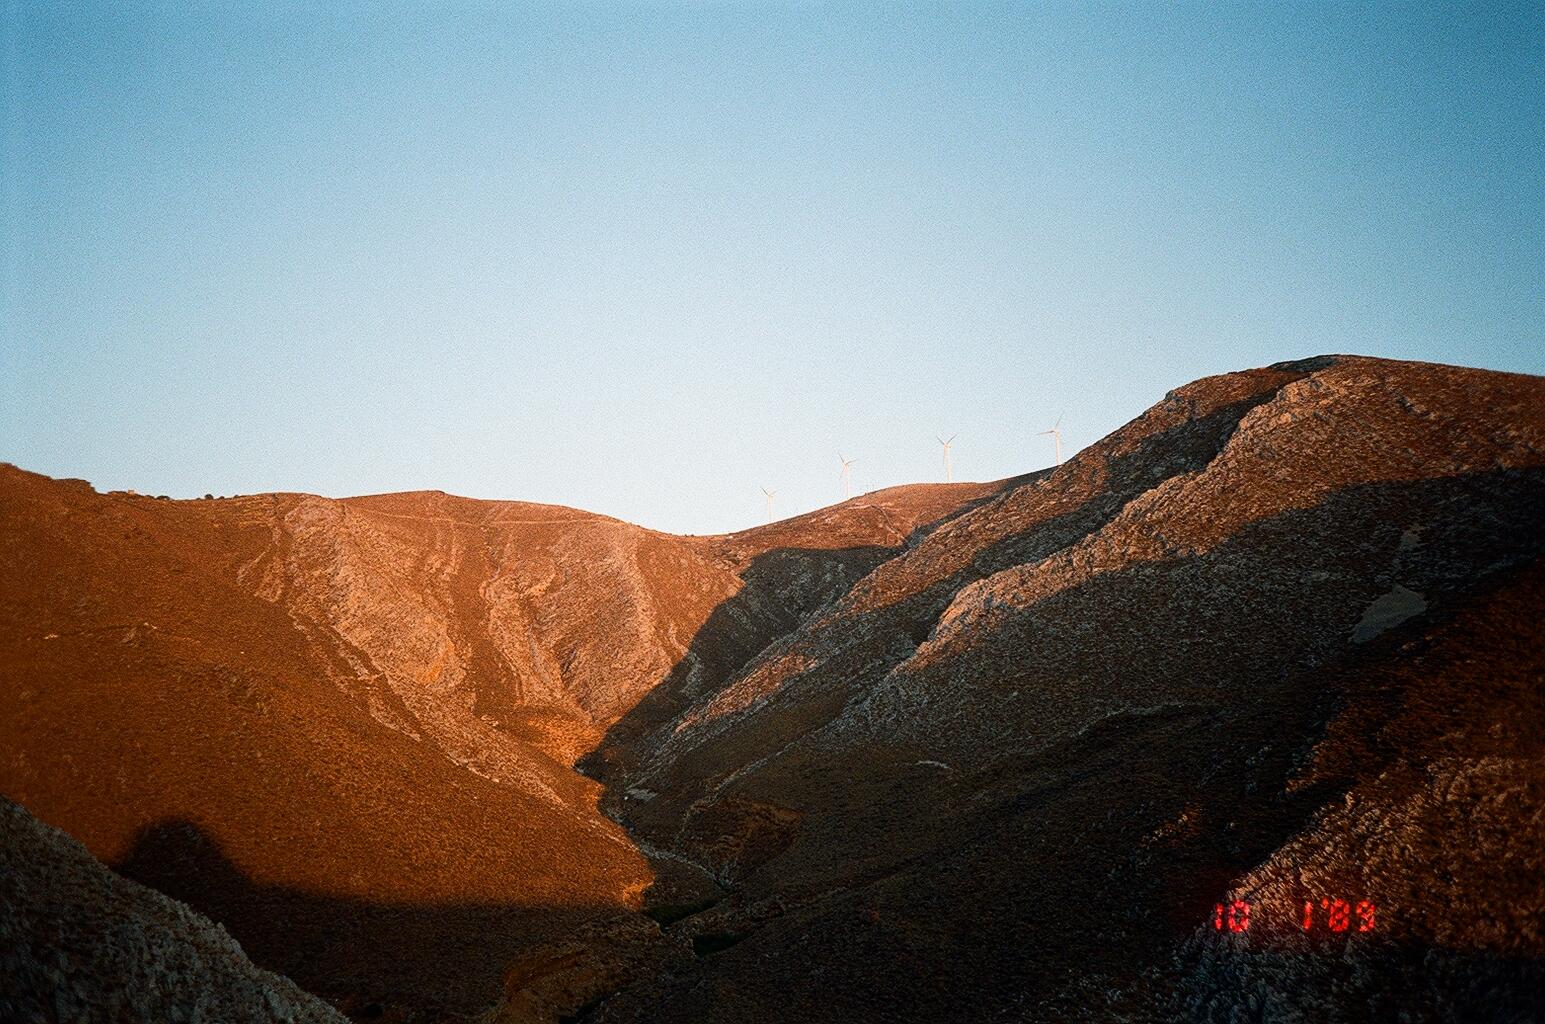 Photo by Myrto Tzima